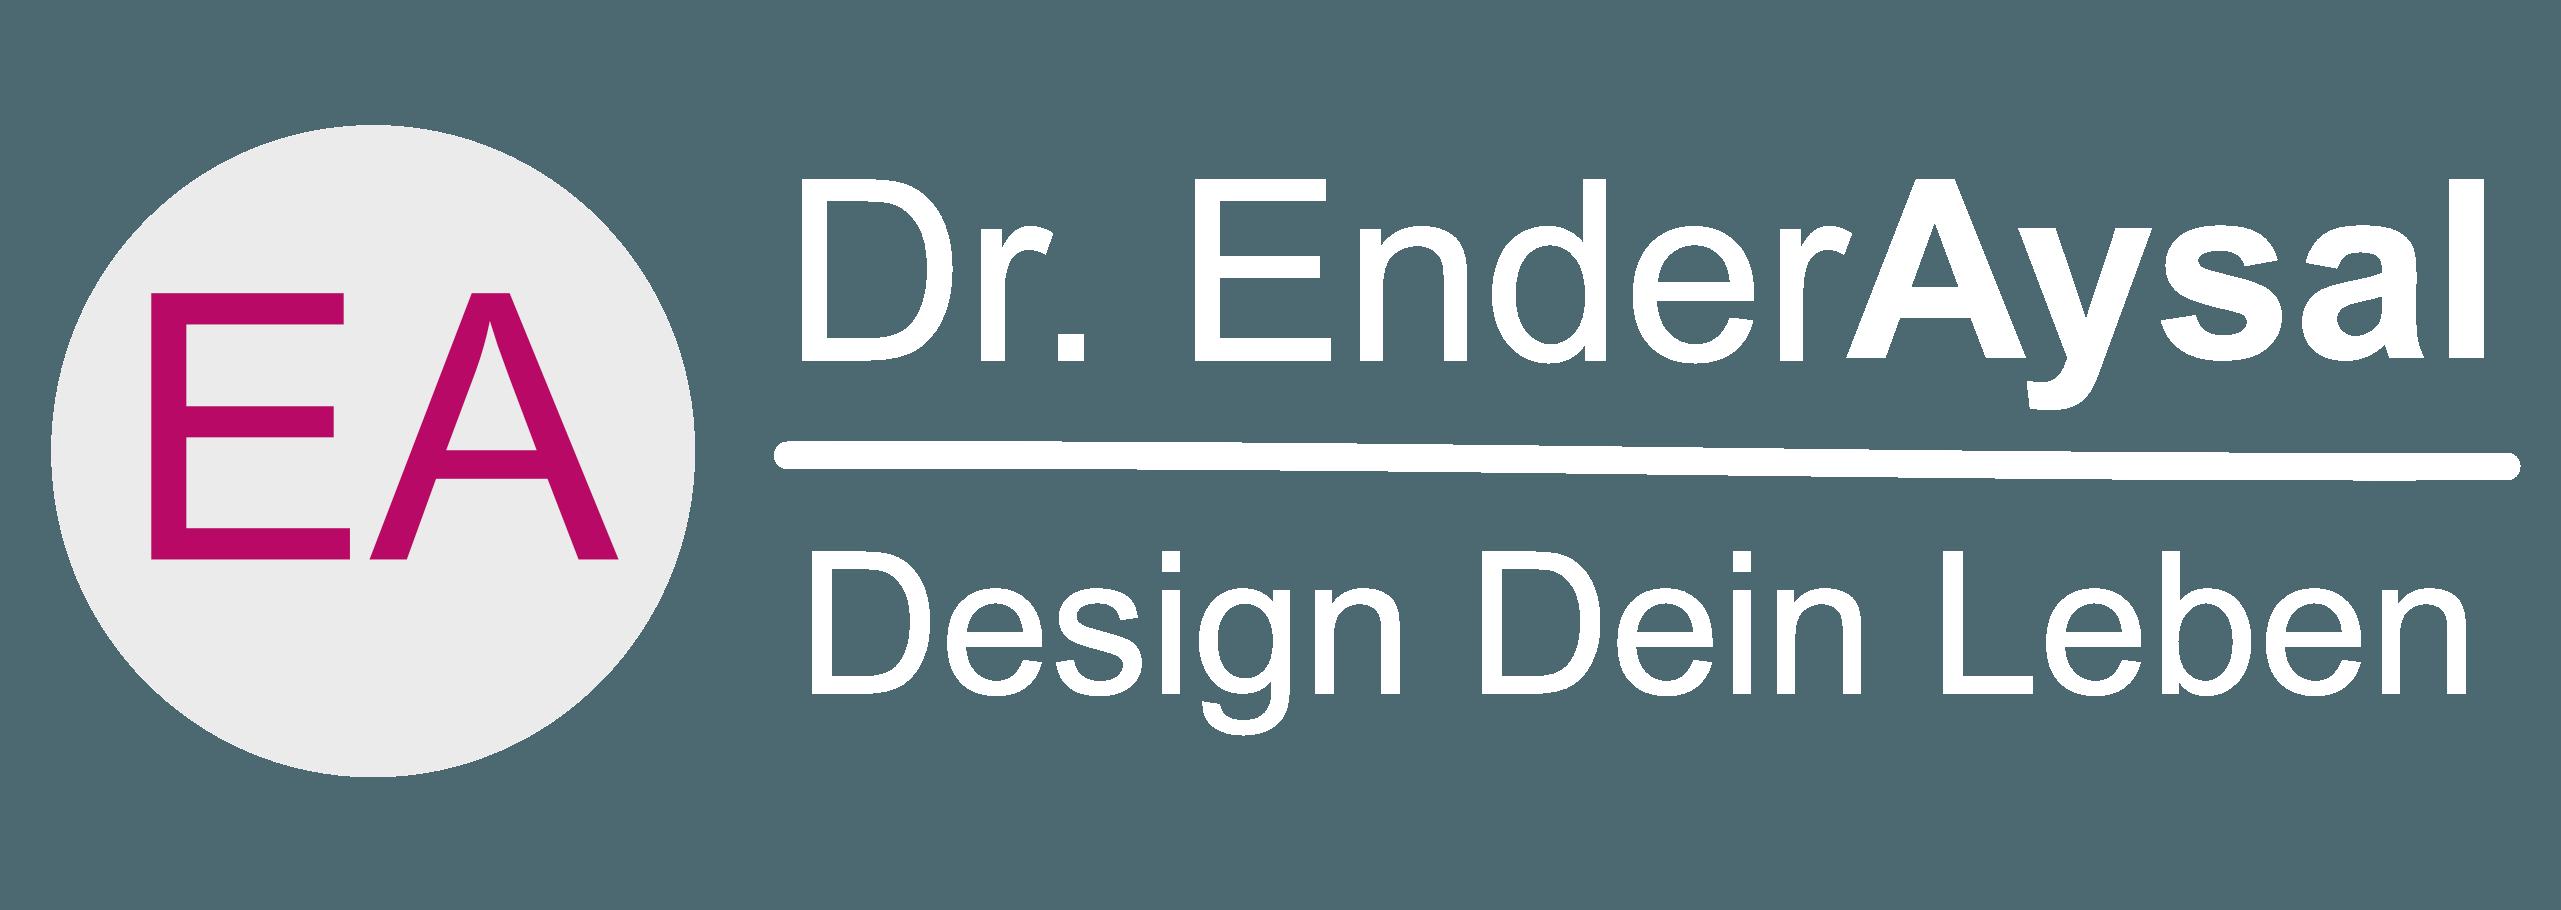 Ender-Aysal.de